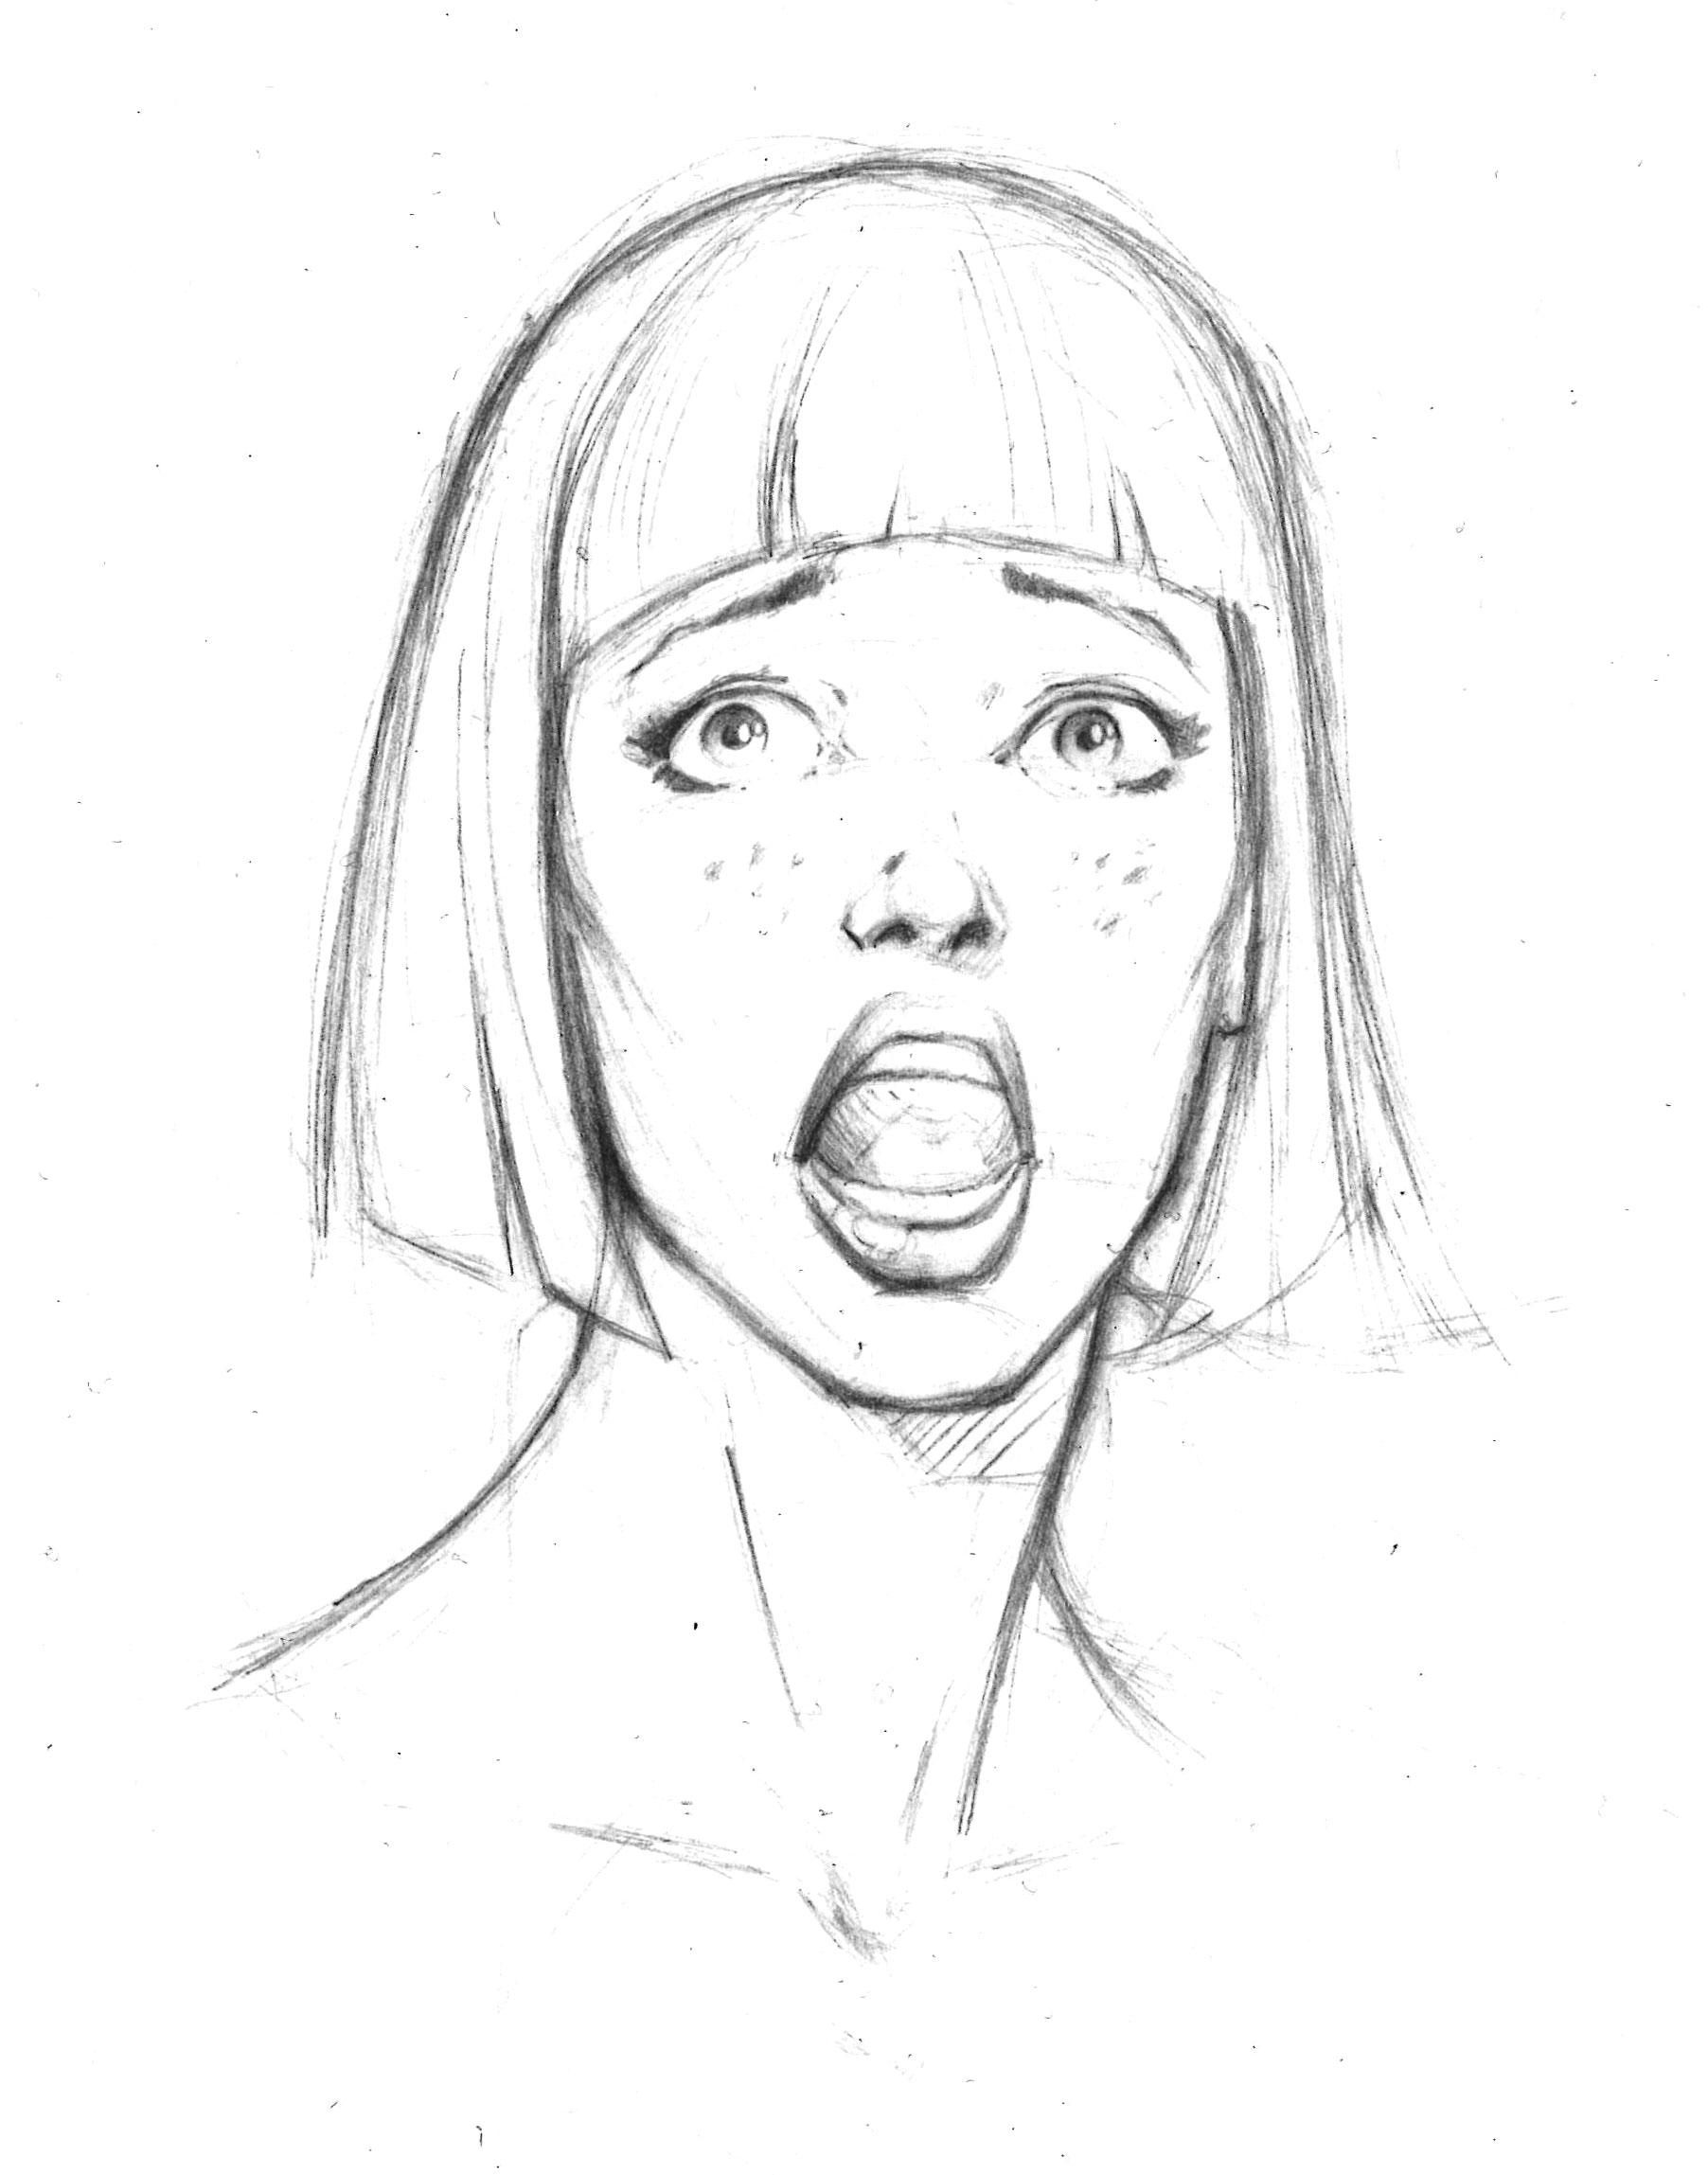 1804x2297 Facial Expression, Fear, Afraid The Pick Up Facial